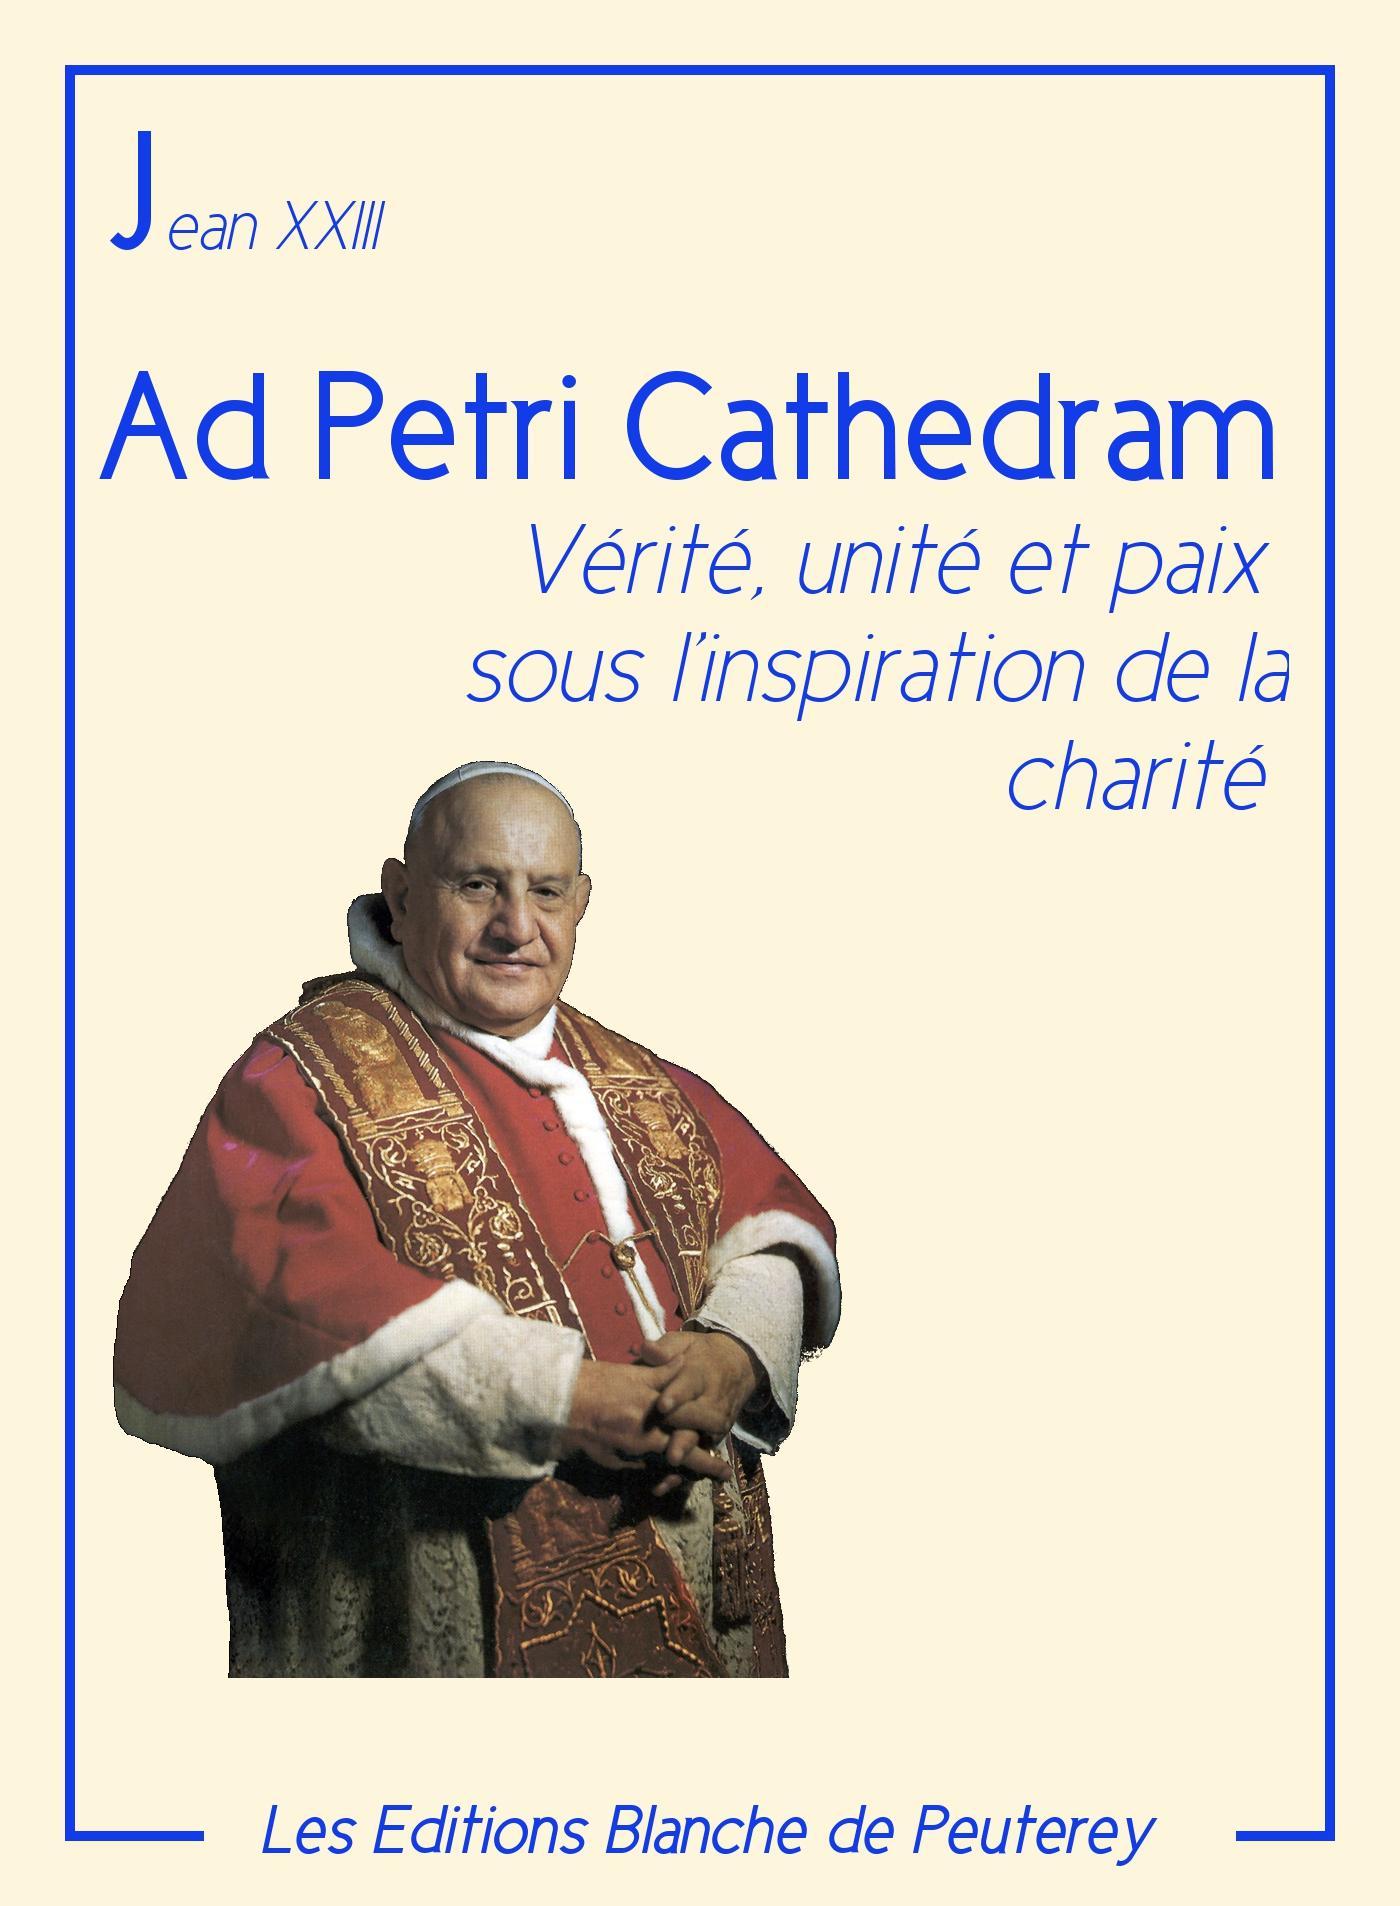 Ad Petri cathedram